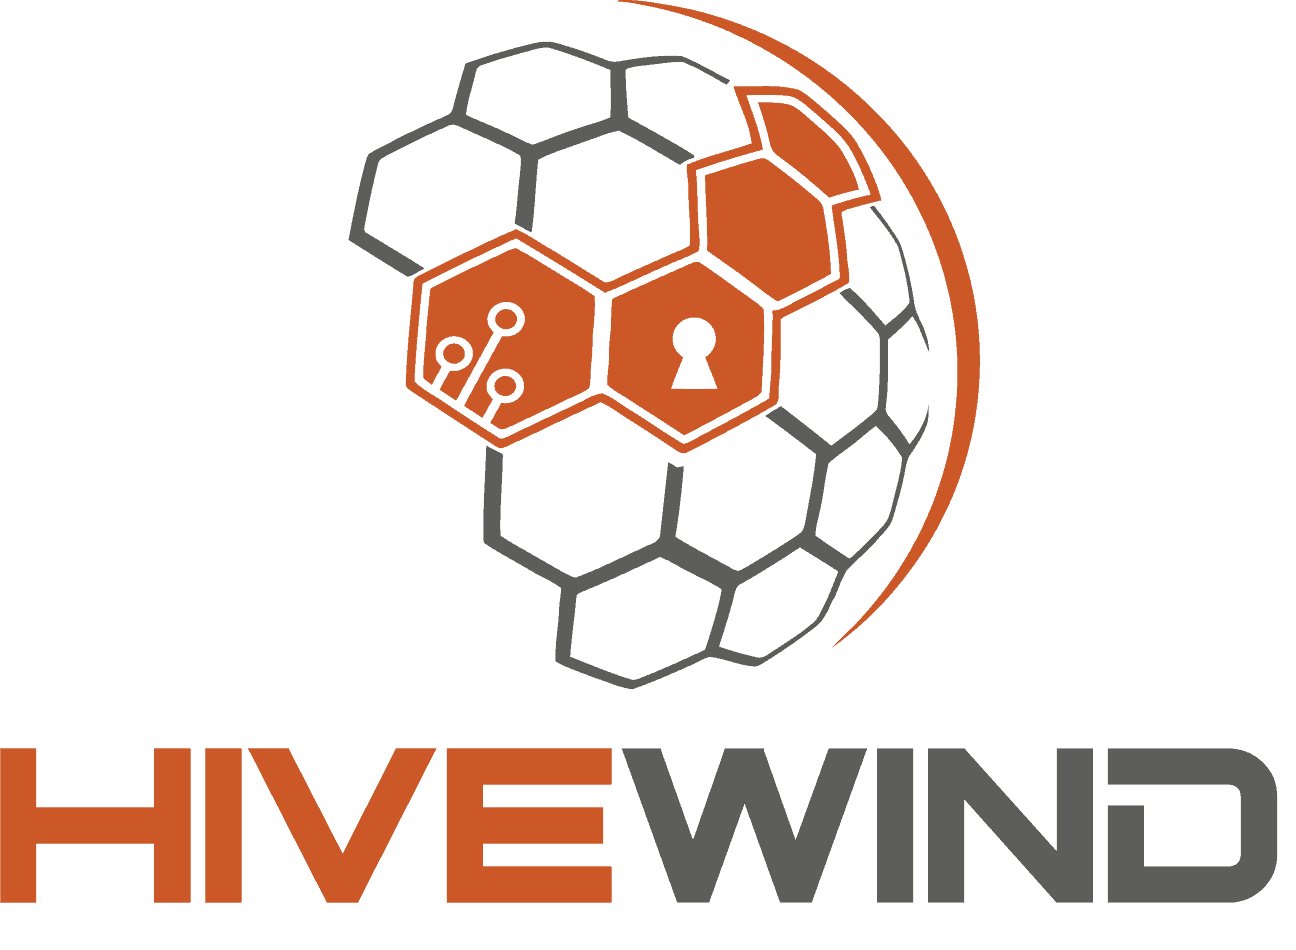 HiveWind